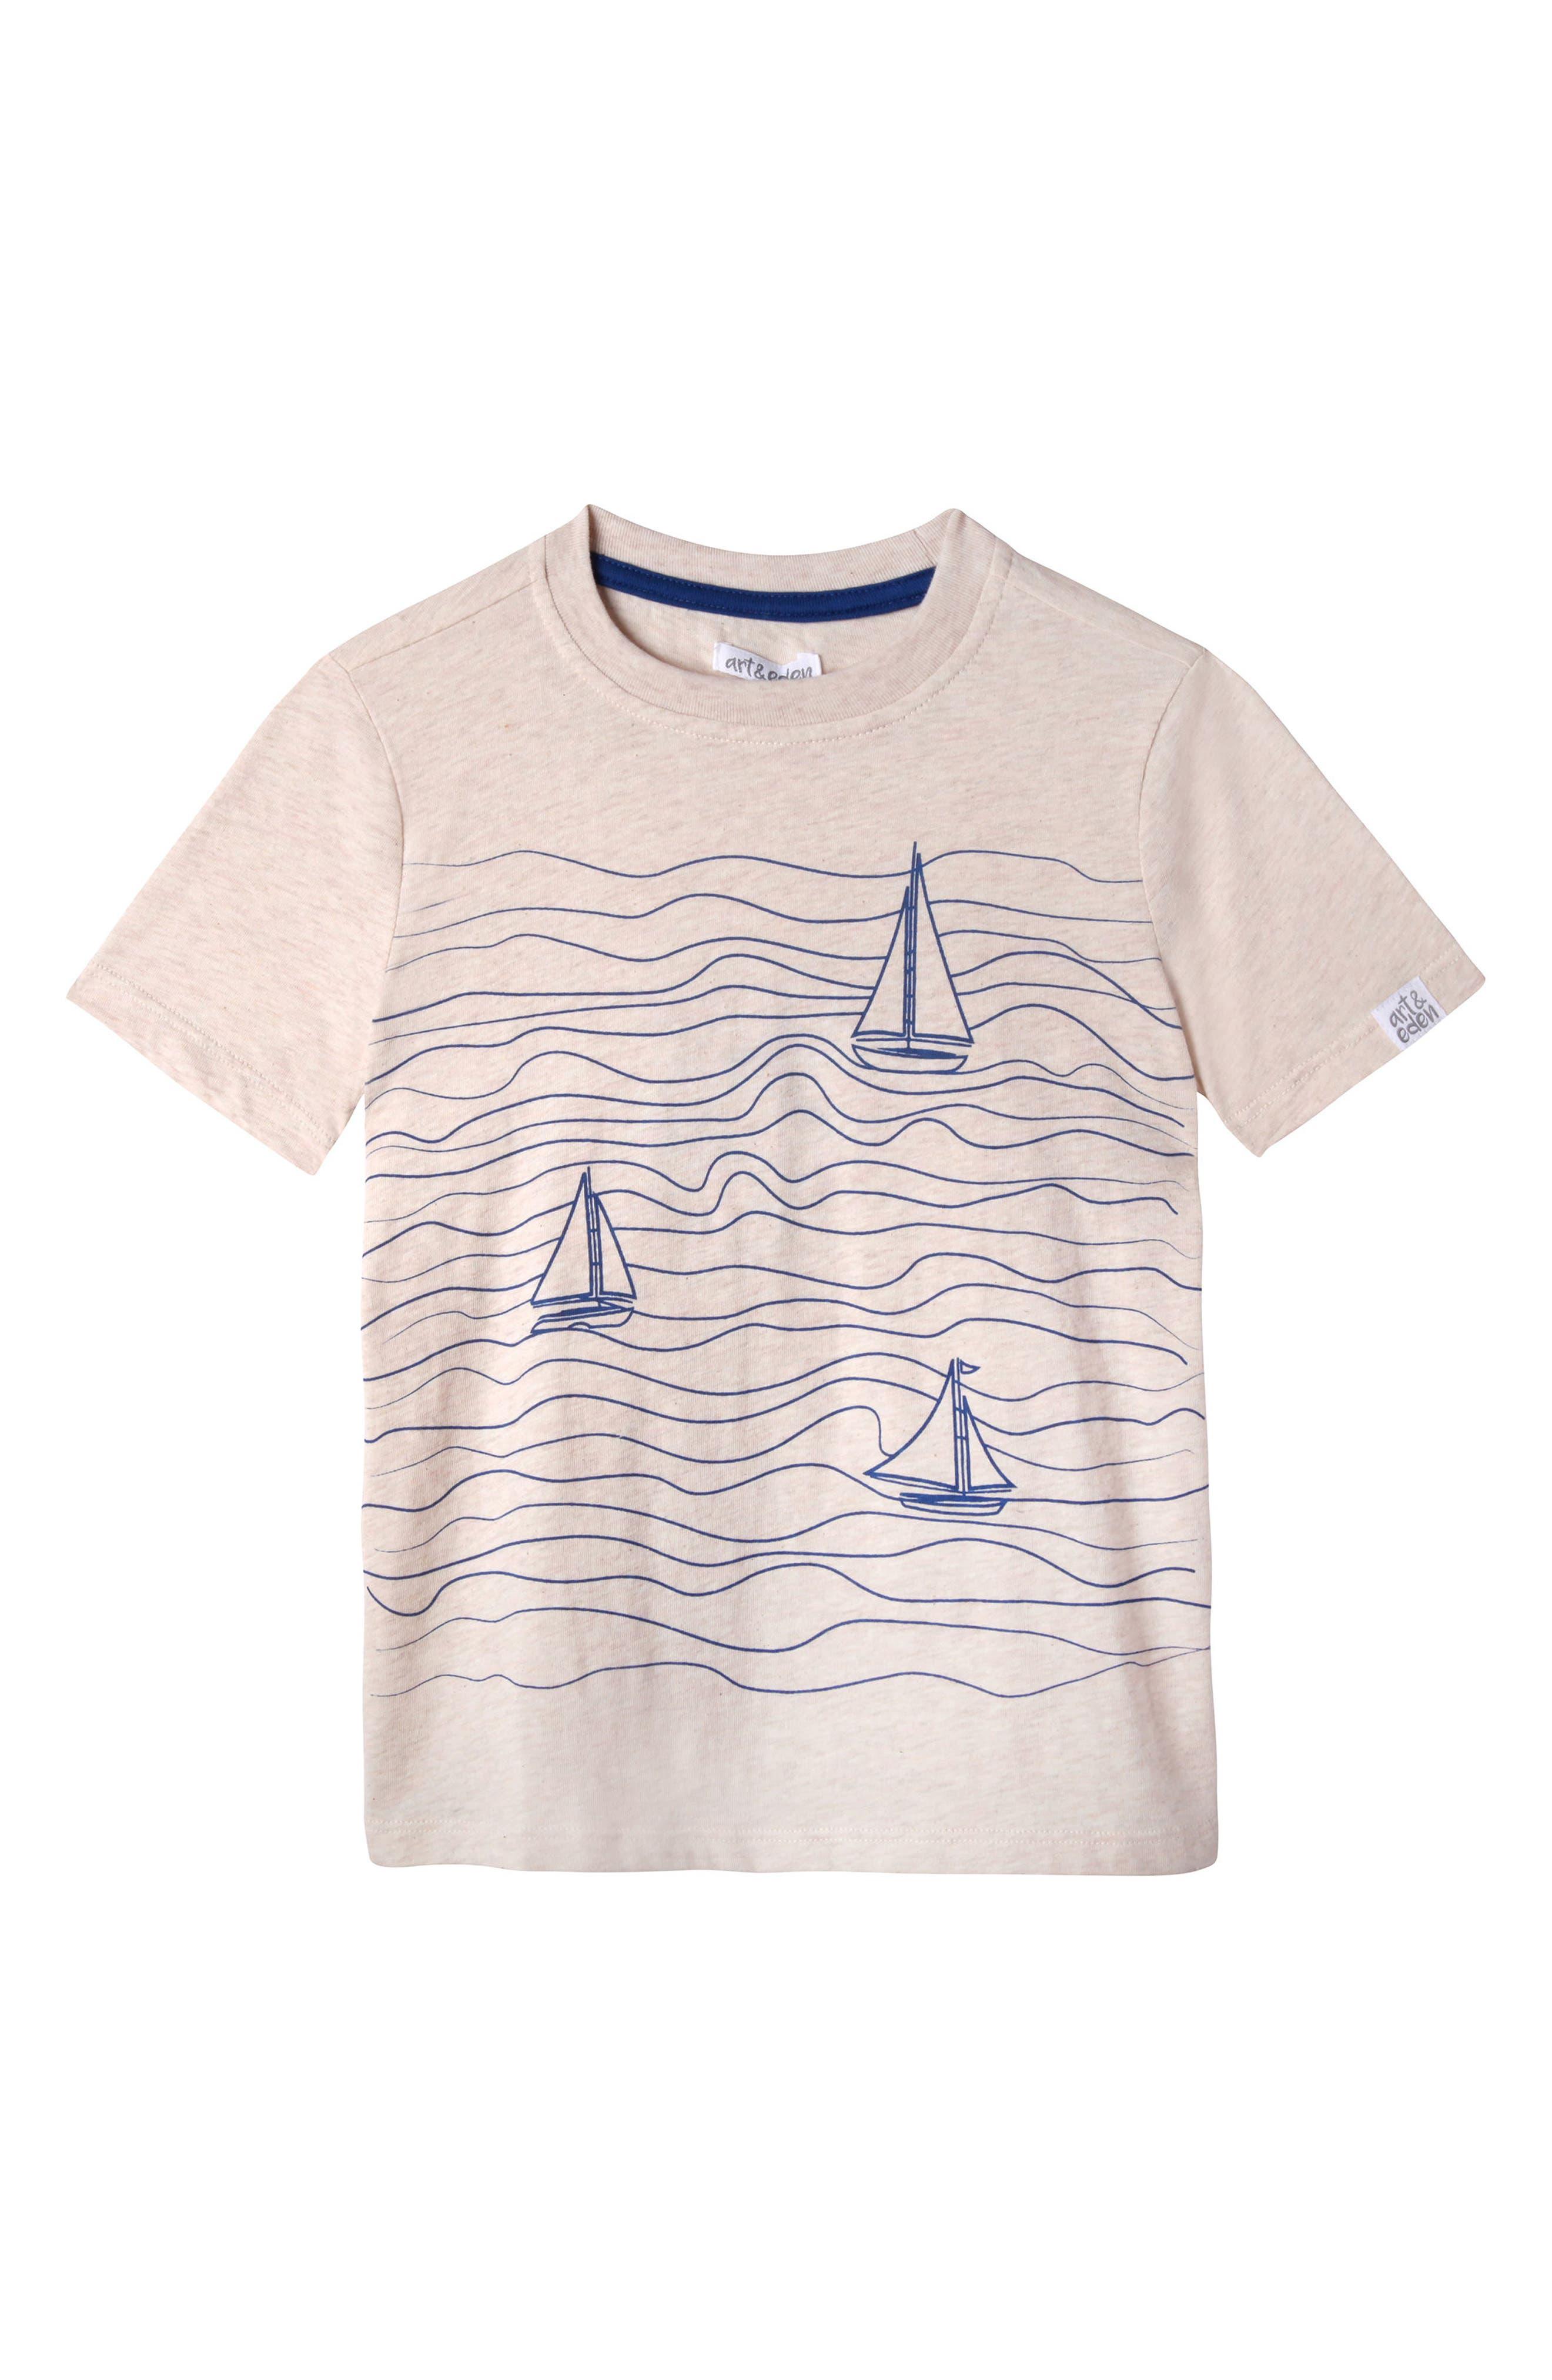 Jacob Sailboat Organic Cotton T-Shirt,                         Main,                         color, 260